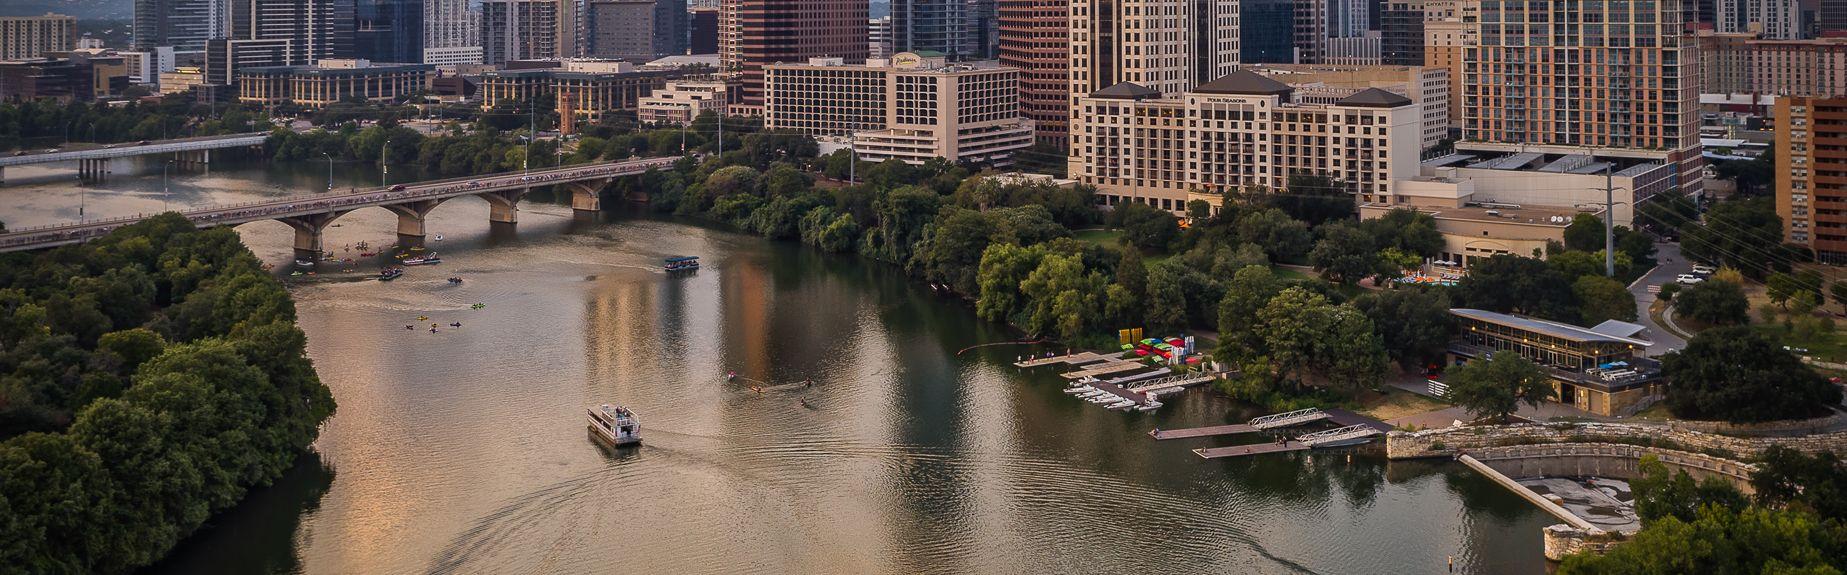 South Congress Avenue, Austin, Texas, Verenigde Staten